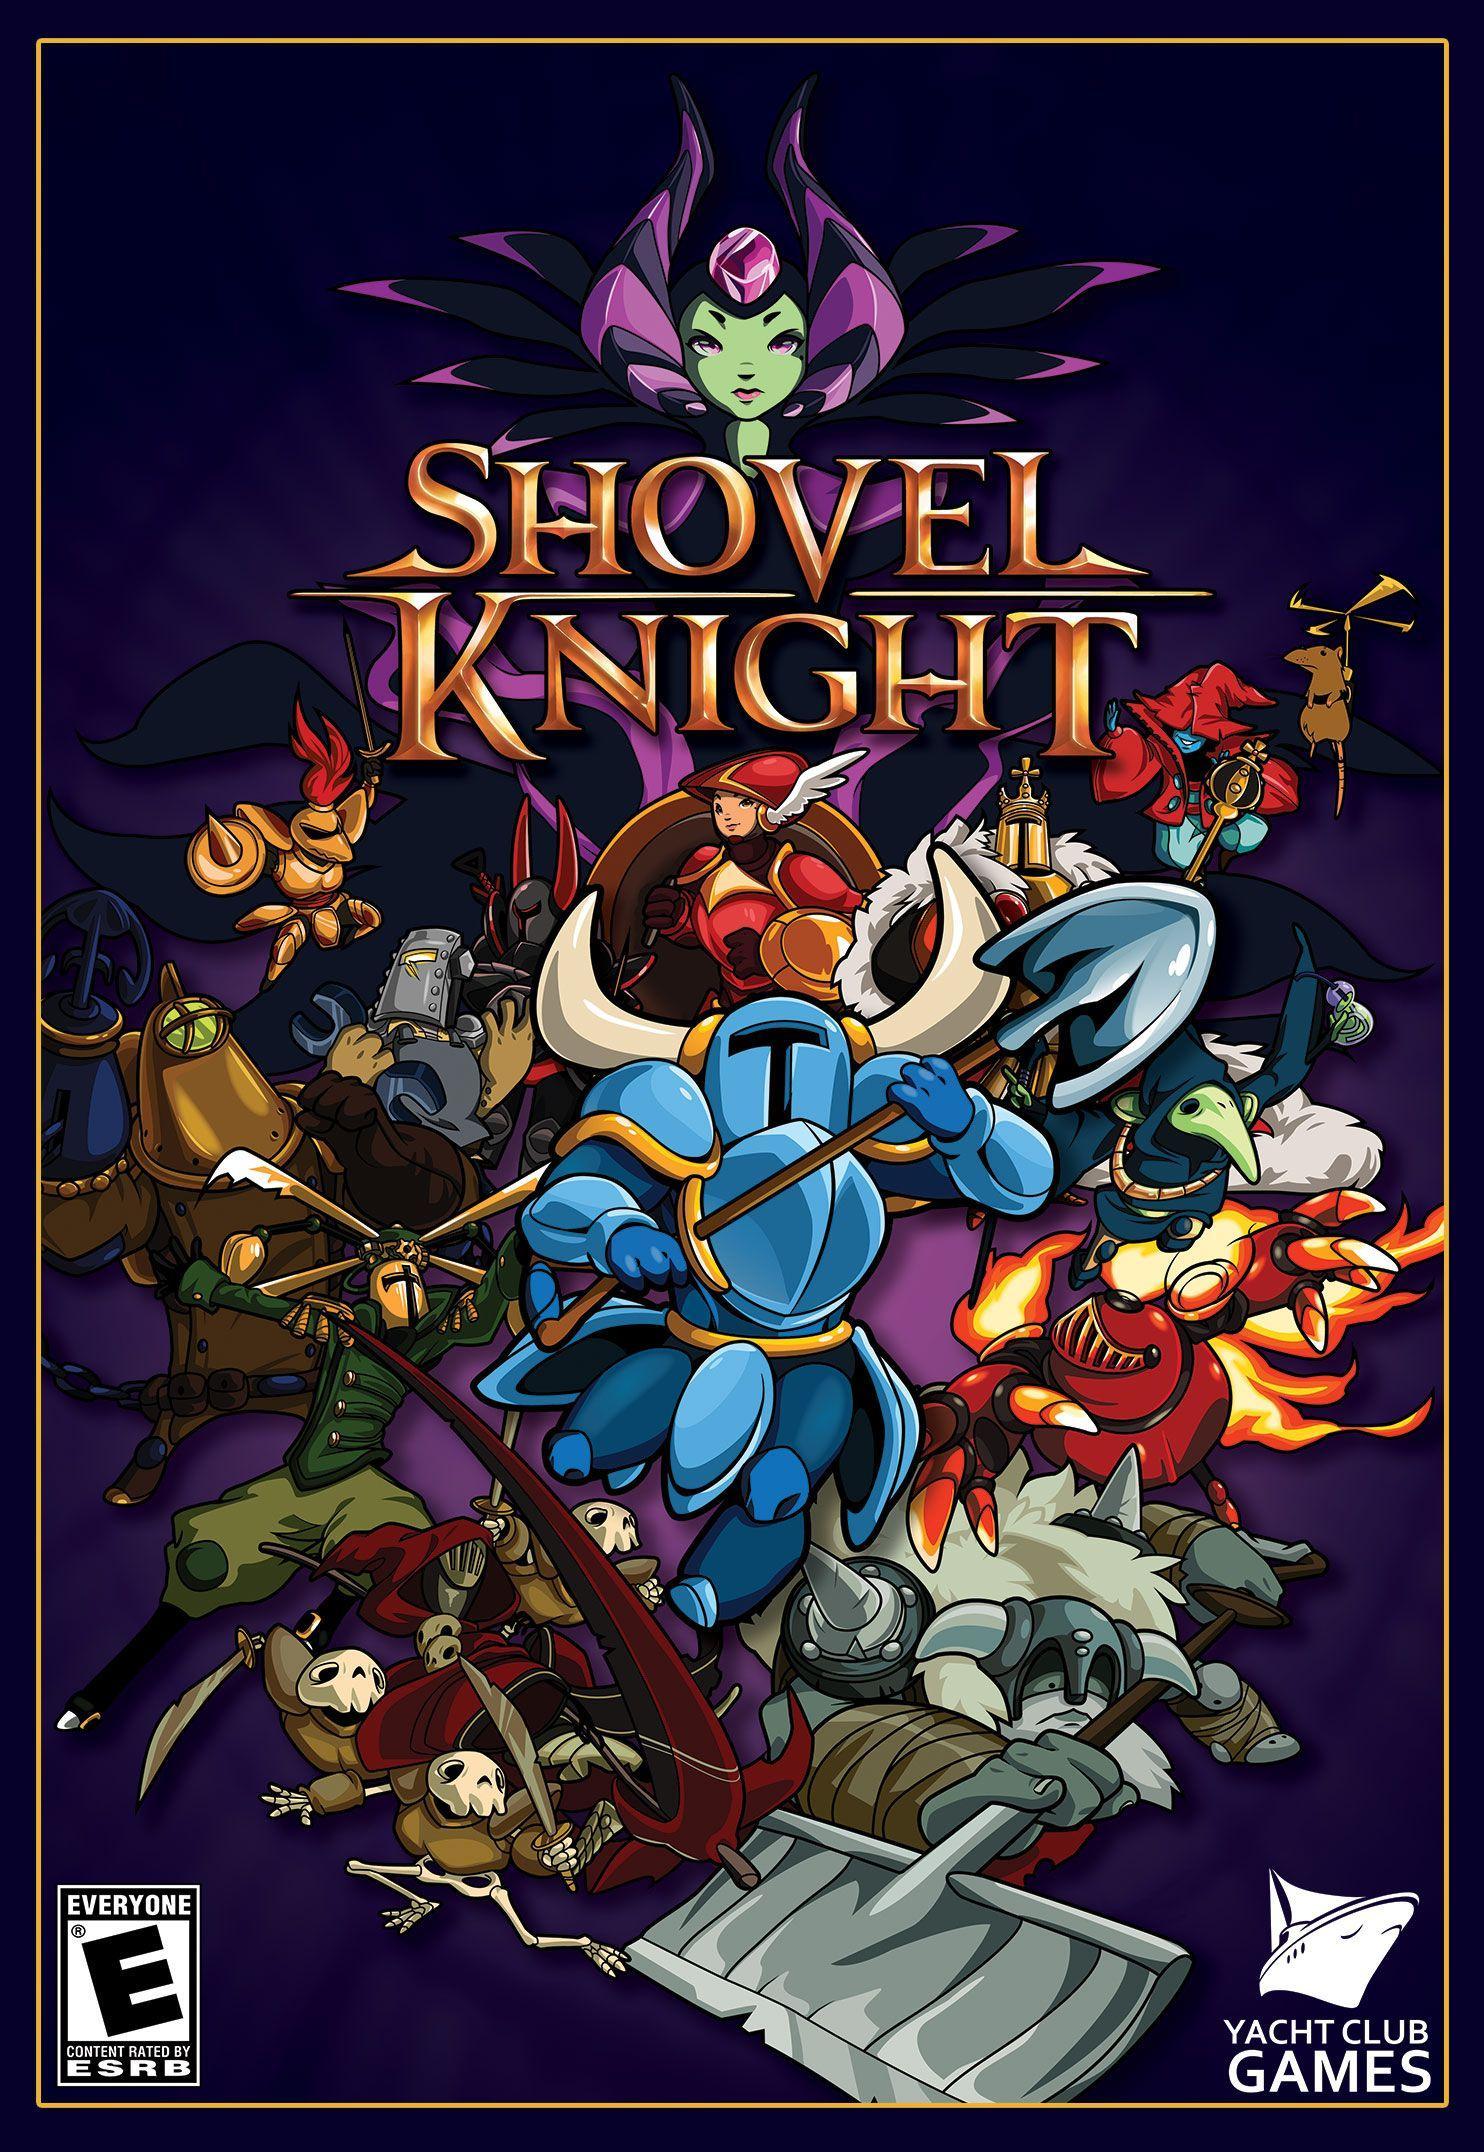 Shovel Knight Wallpapers Top Free Shovel Knight Backgrounds Wallpaperaccess